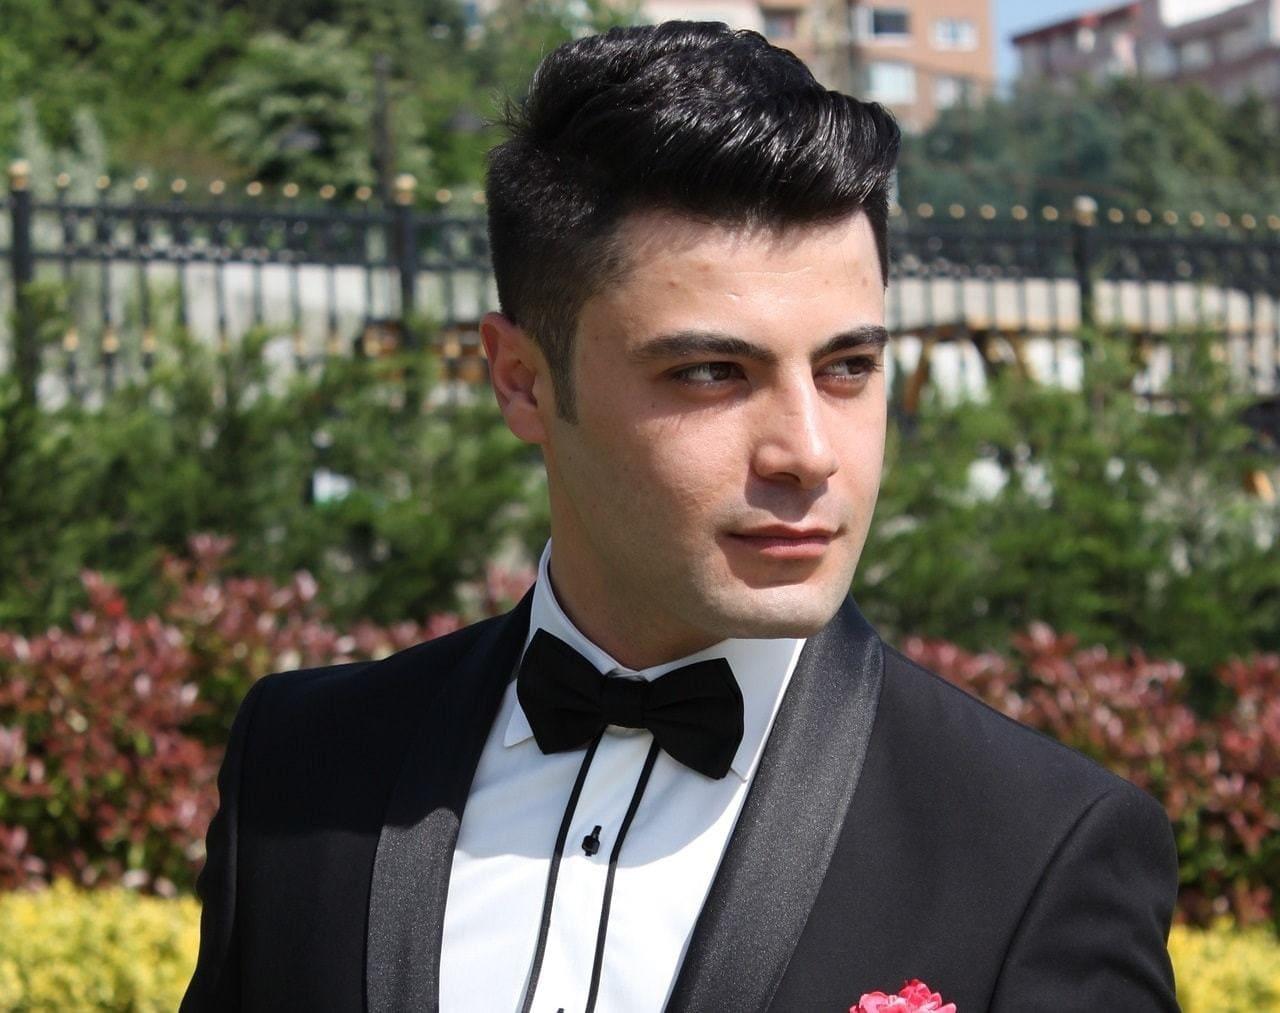 Elegância da gravata borboleta em um look Black Tie